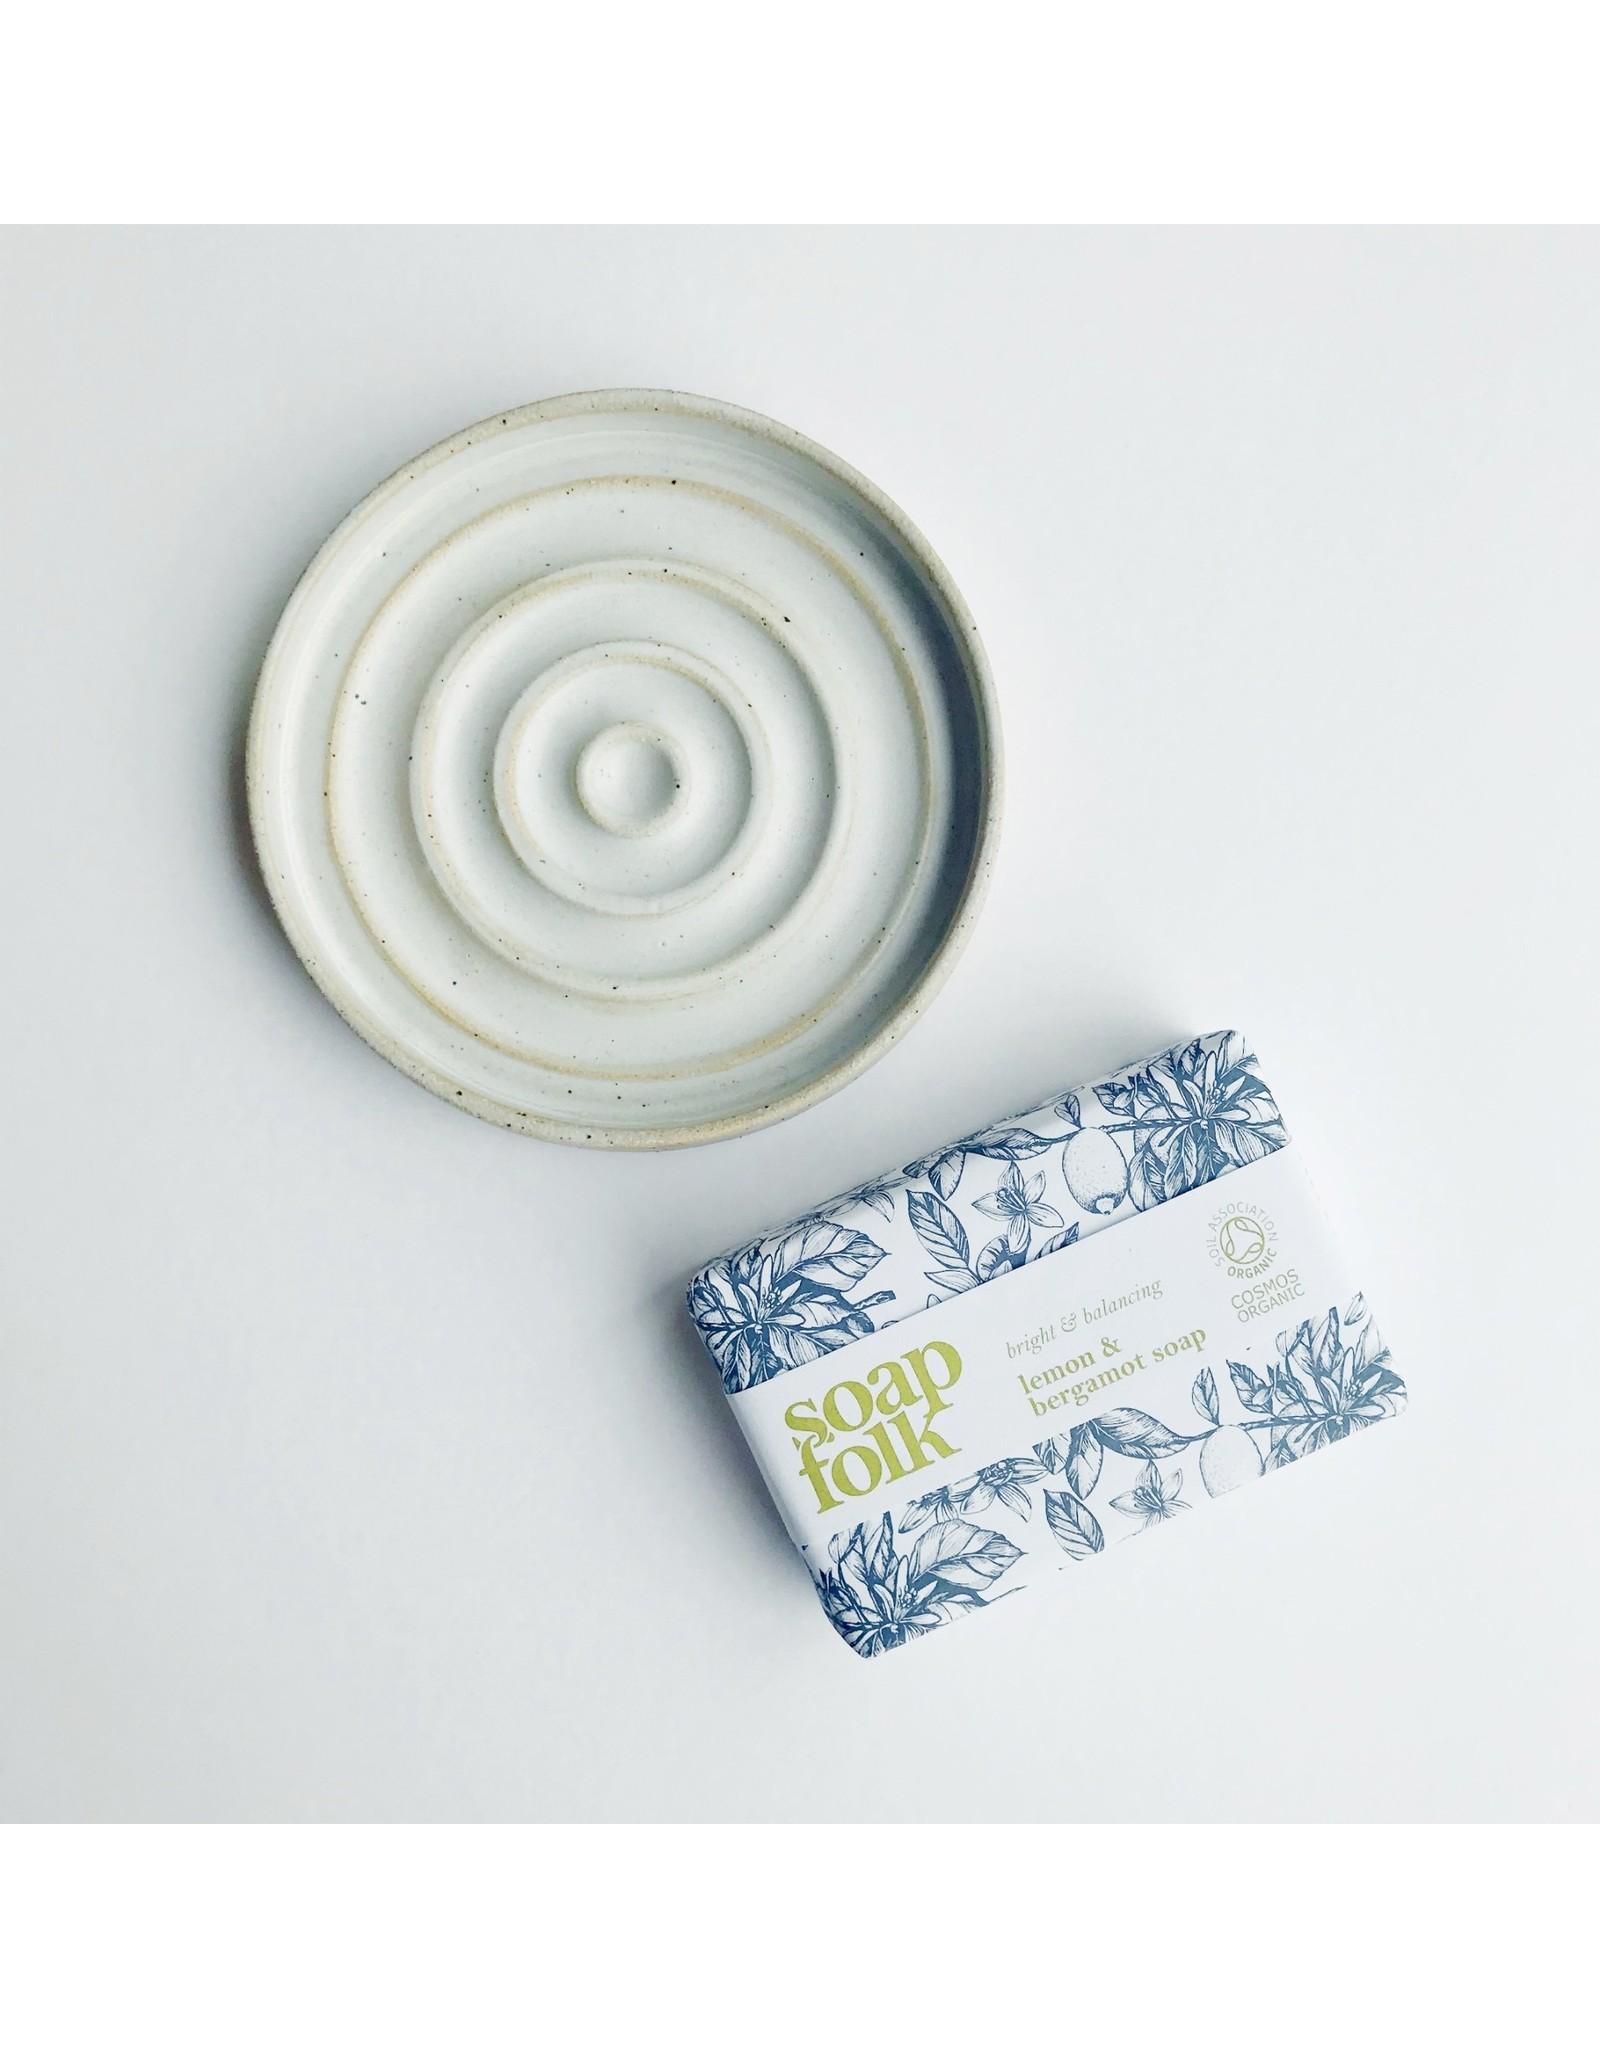 Letterbox Gift Set - Organic Soap & Dish